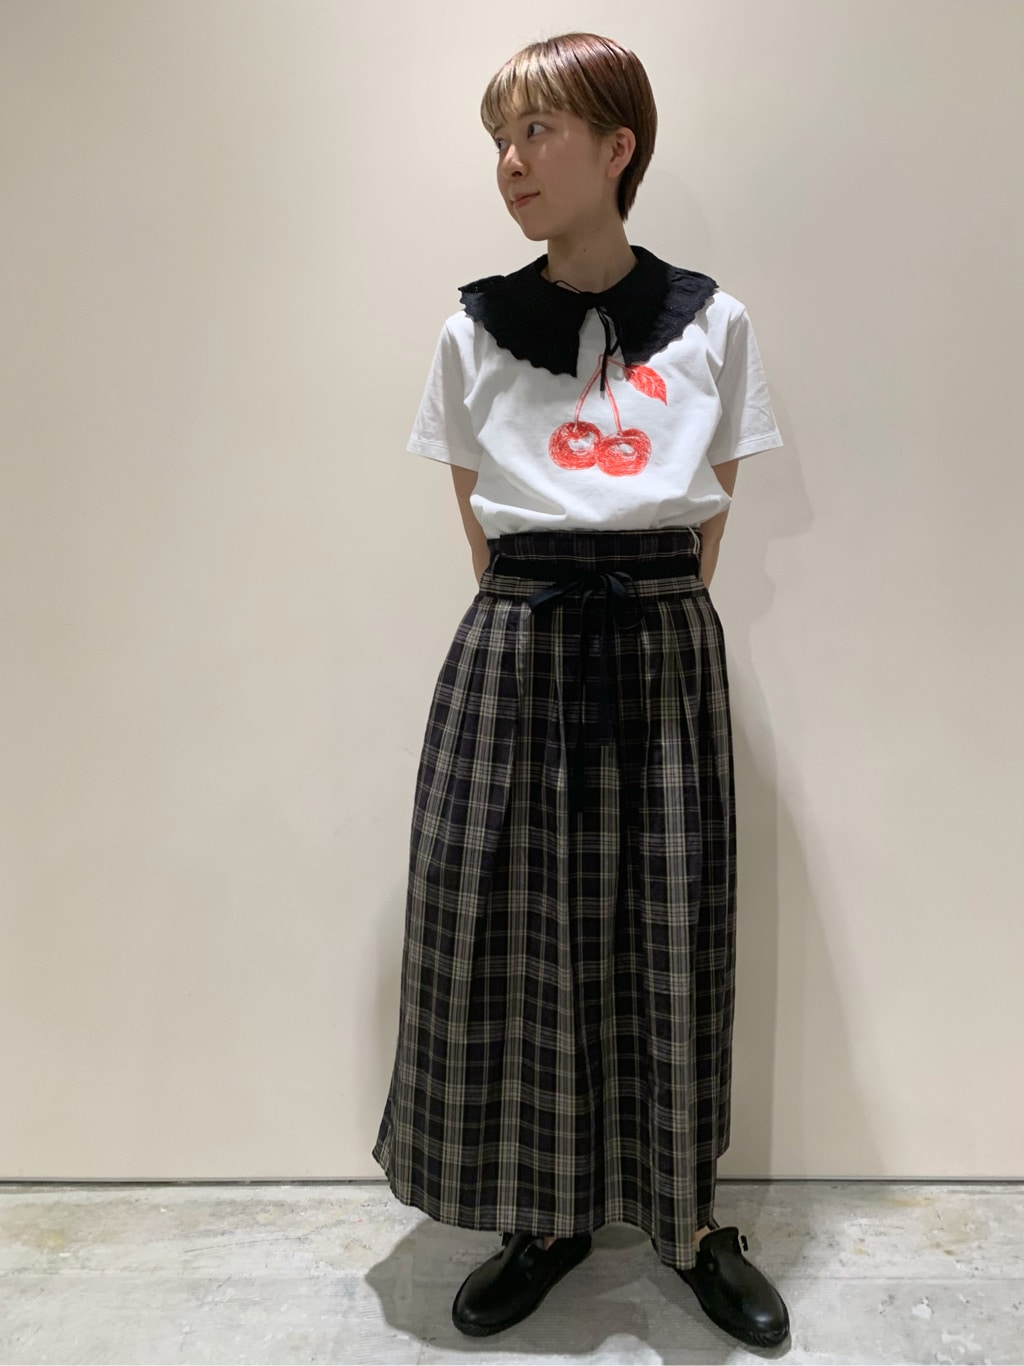 - CHILD WOMAN CHILD WOMAN , PAR ICI ルミネ横浜 身長:158cm 2021.06.03